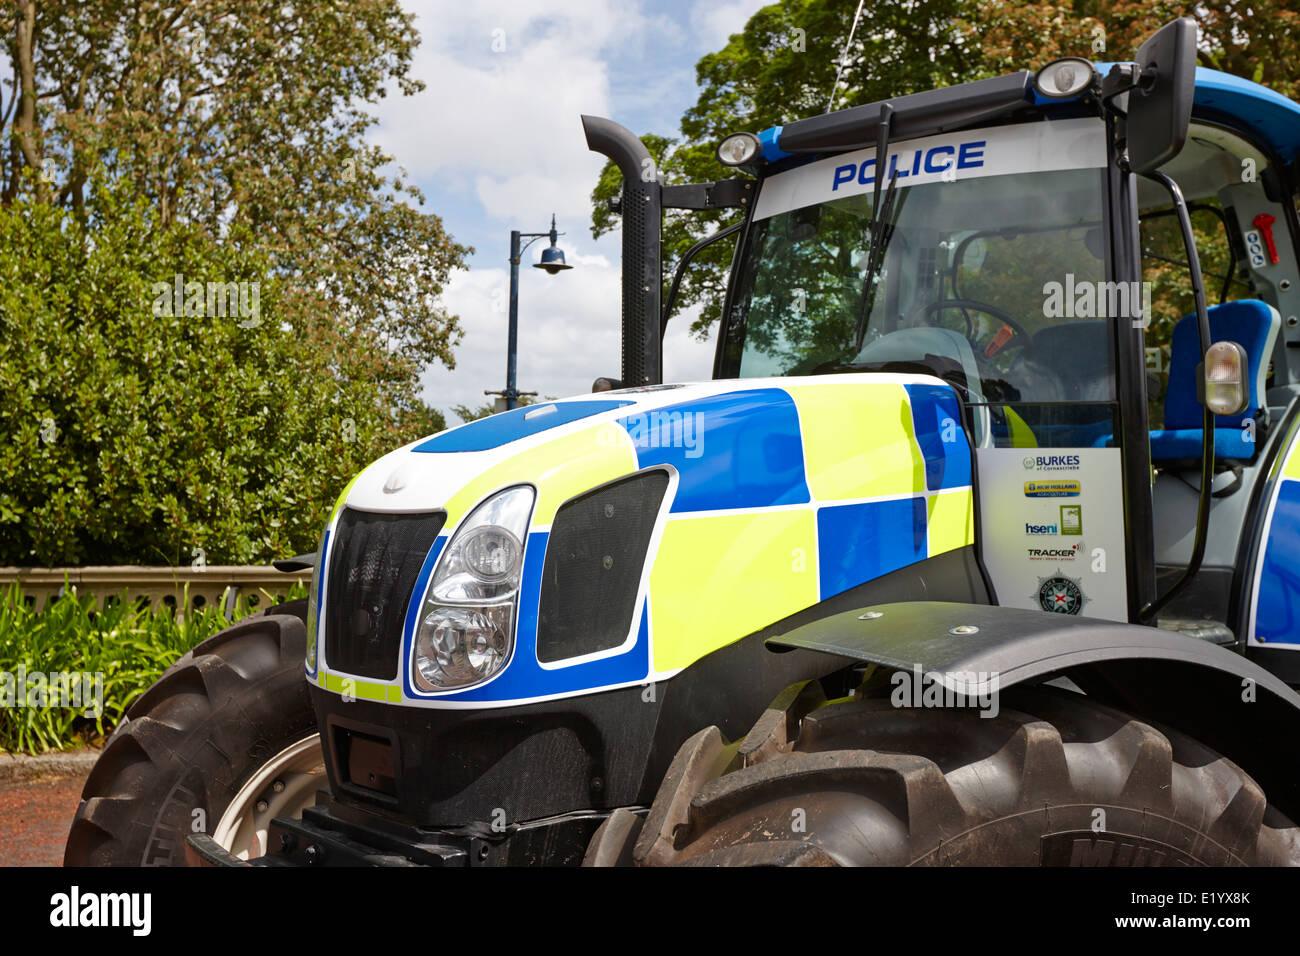 psni battenberg livery tractor on display bangor northern ireland - Stock Image